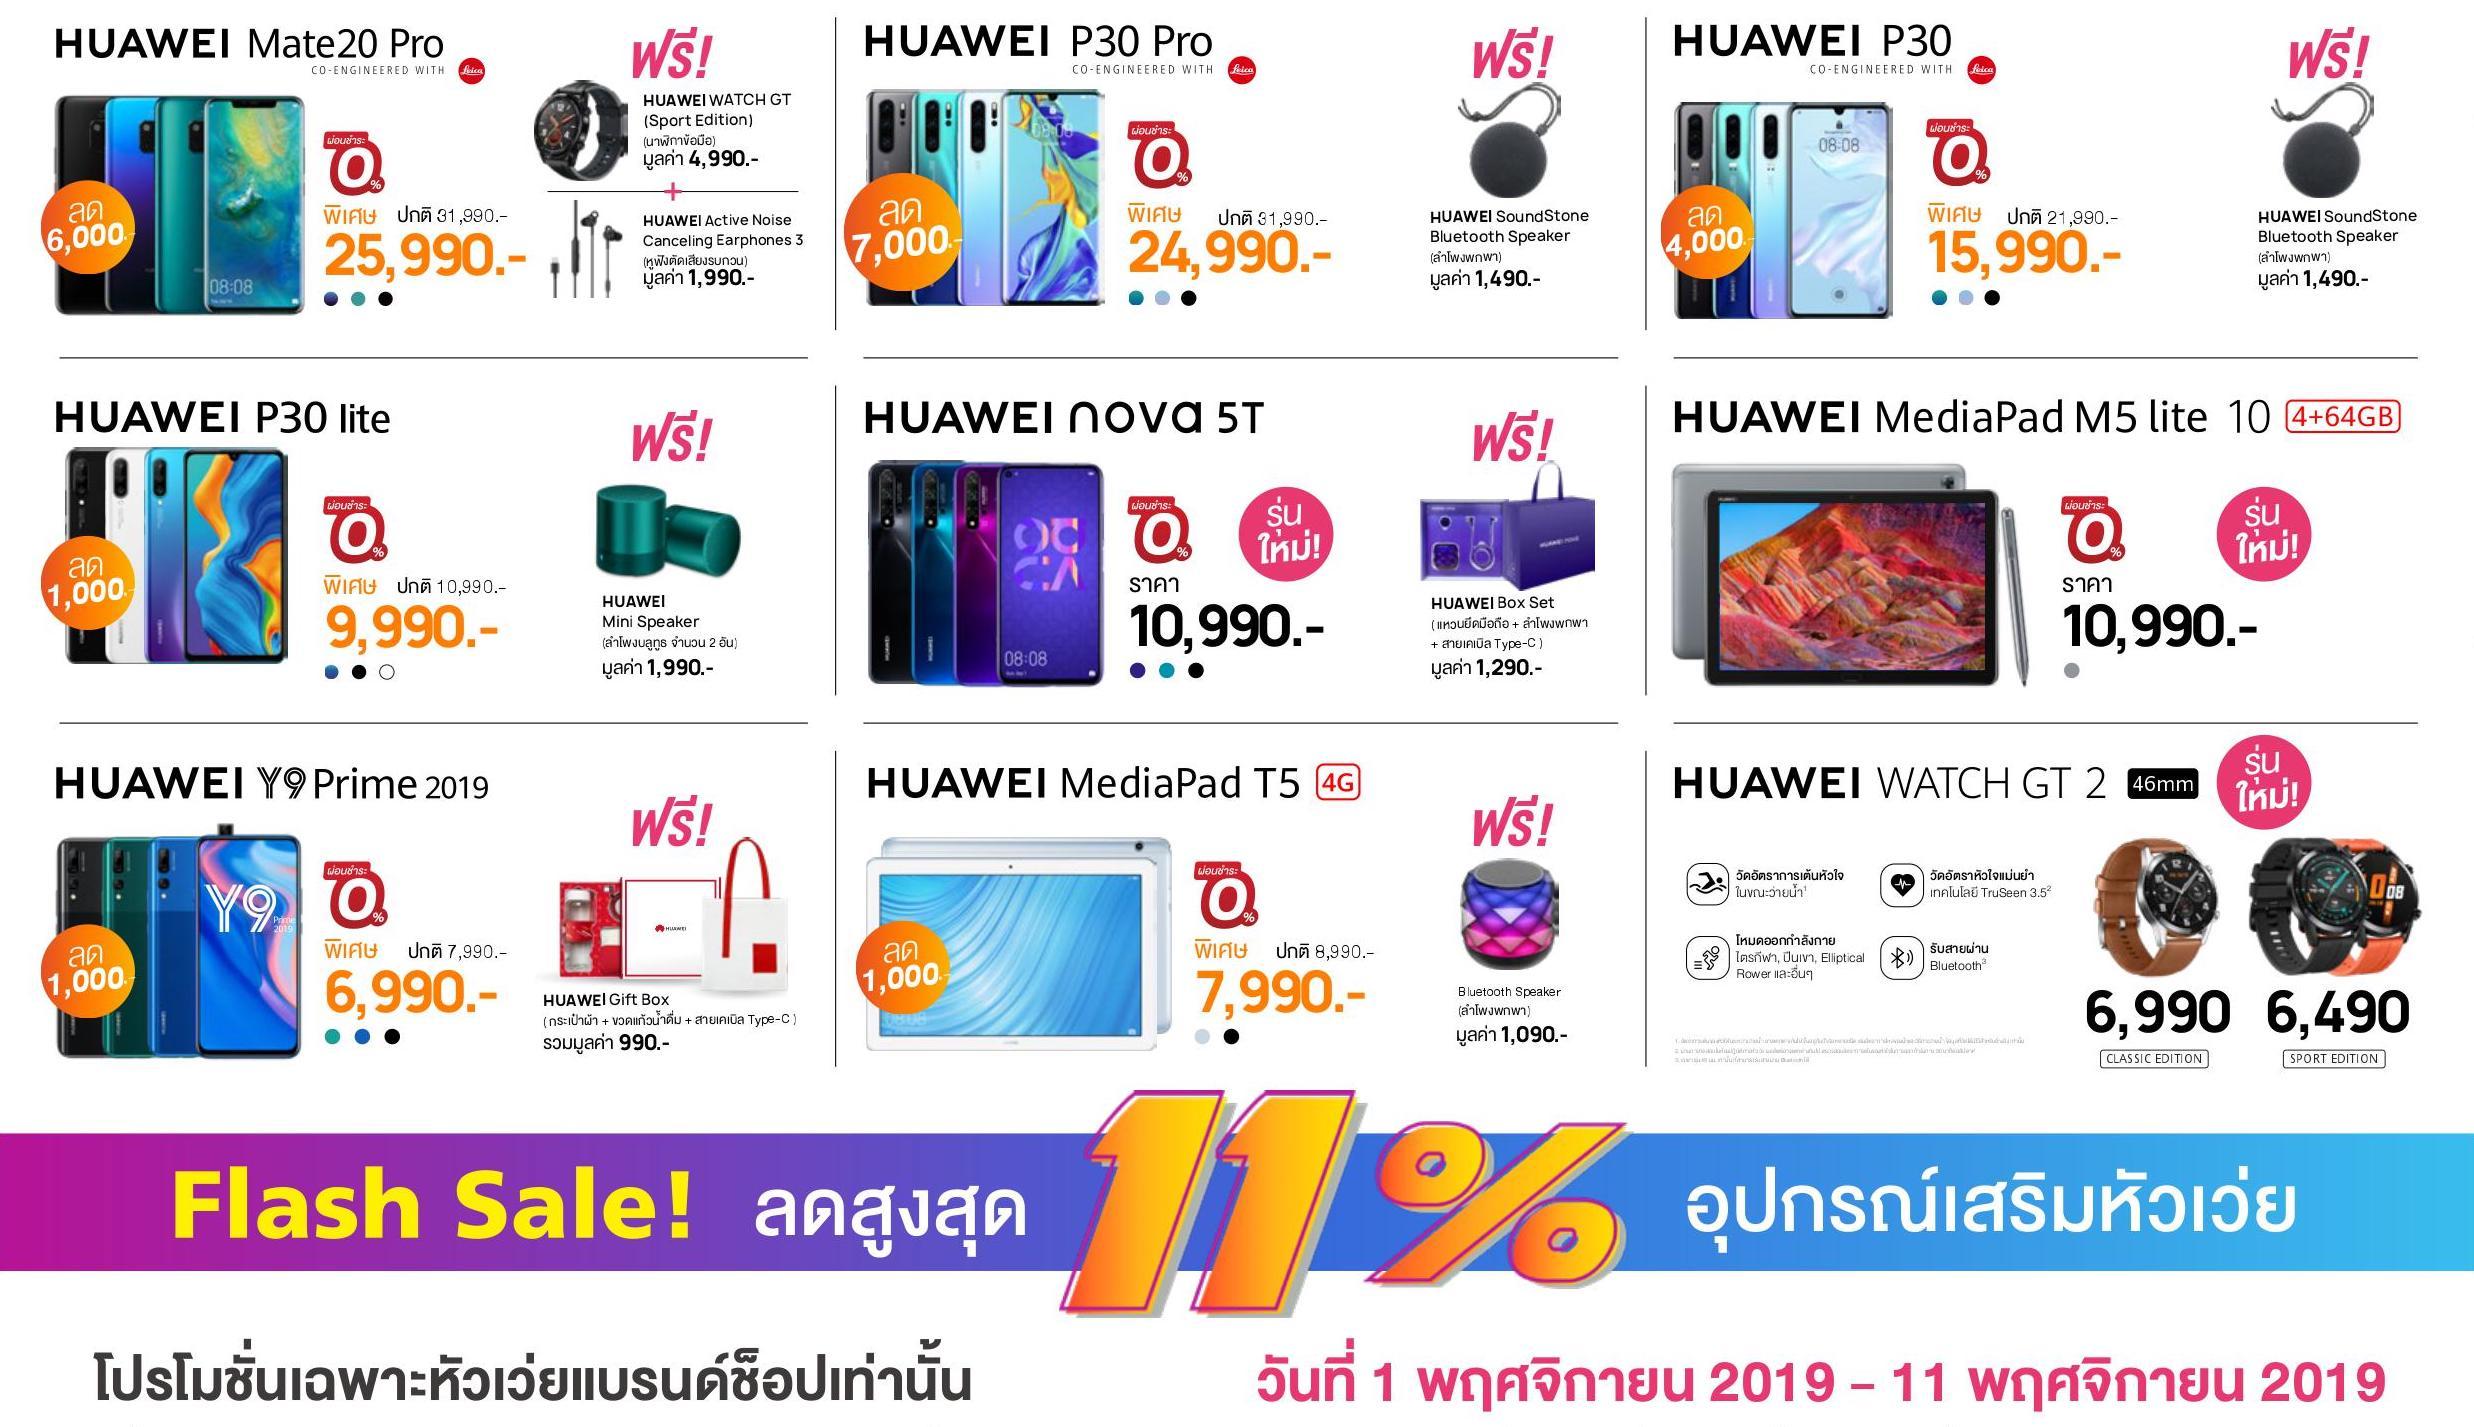 HUAWEI Fest 2019 Campaign 11.11 Promotion Detail